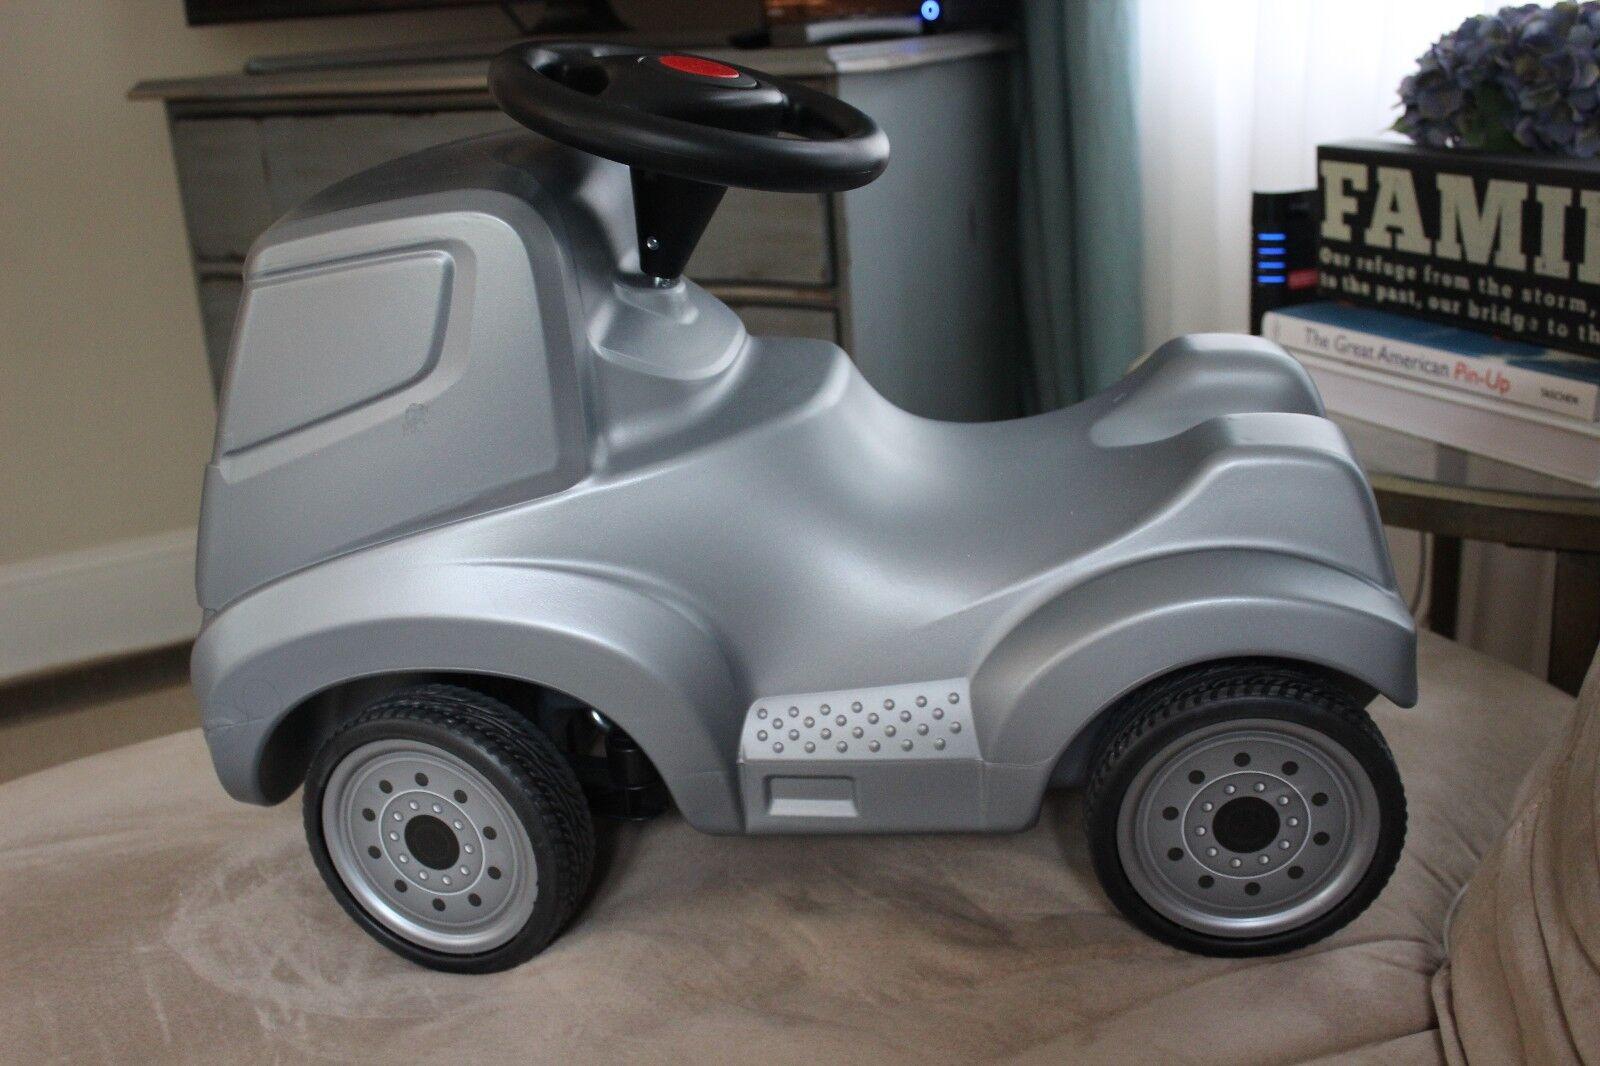 Ferbedo Mercedes Correpasillos coche Plata raro de Alemania duro encontrar elemento